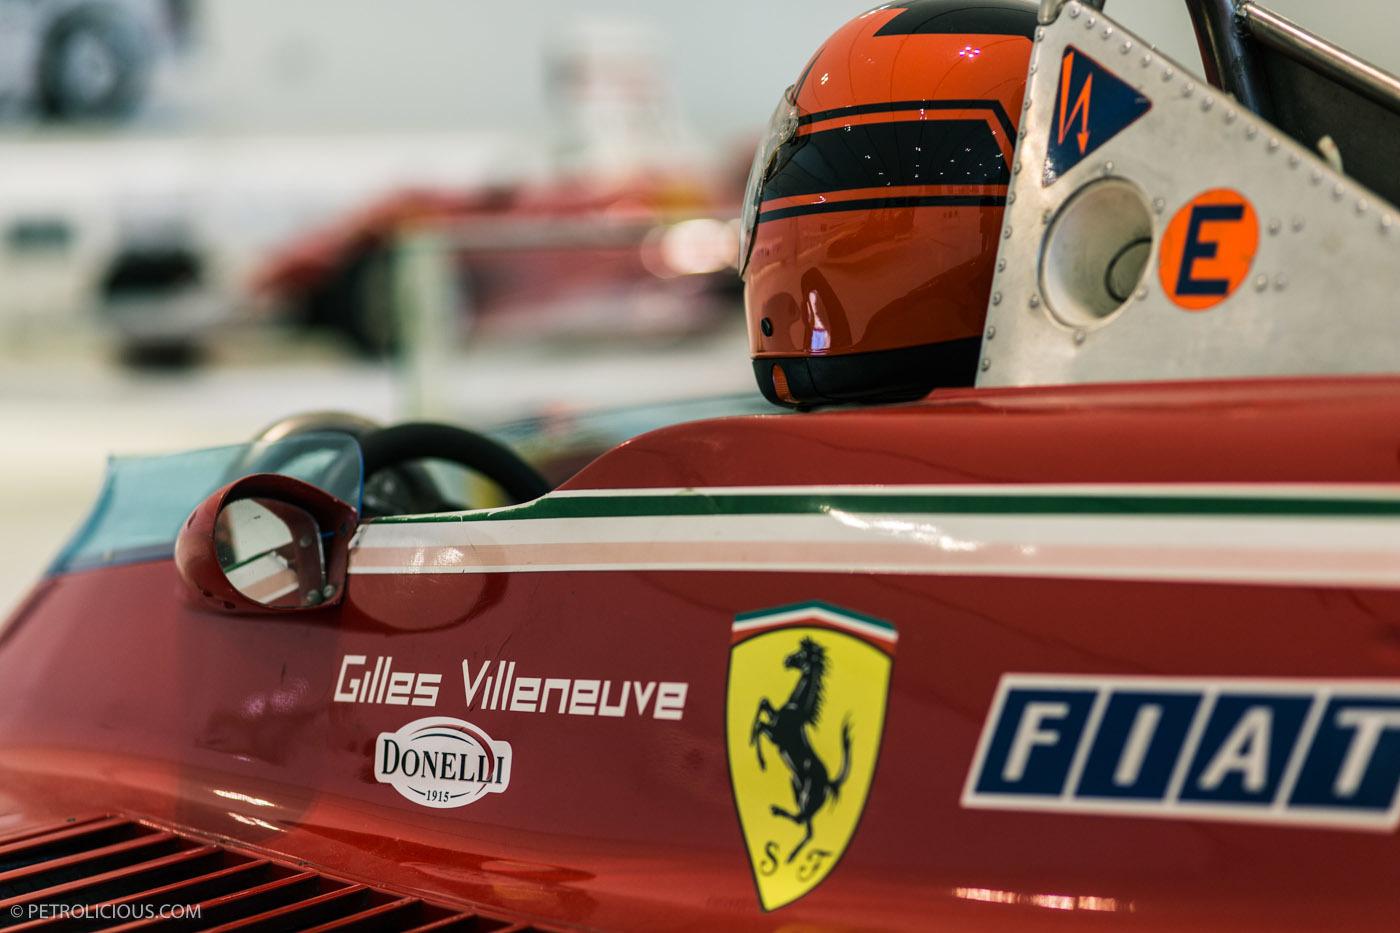 我々は挑戦者 by Ferrari_c0023278_19461262.jpg